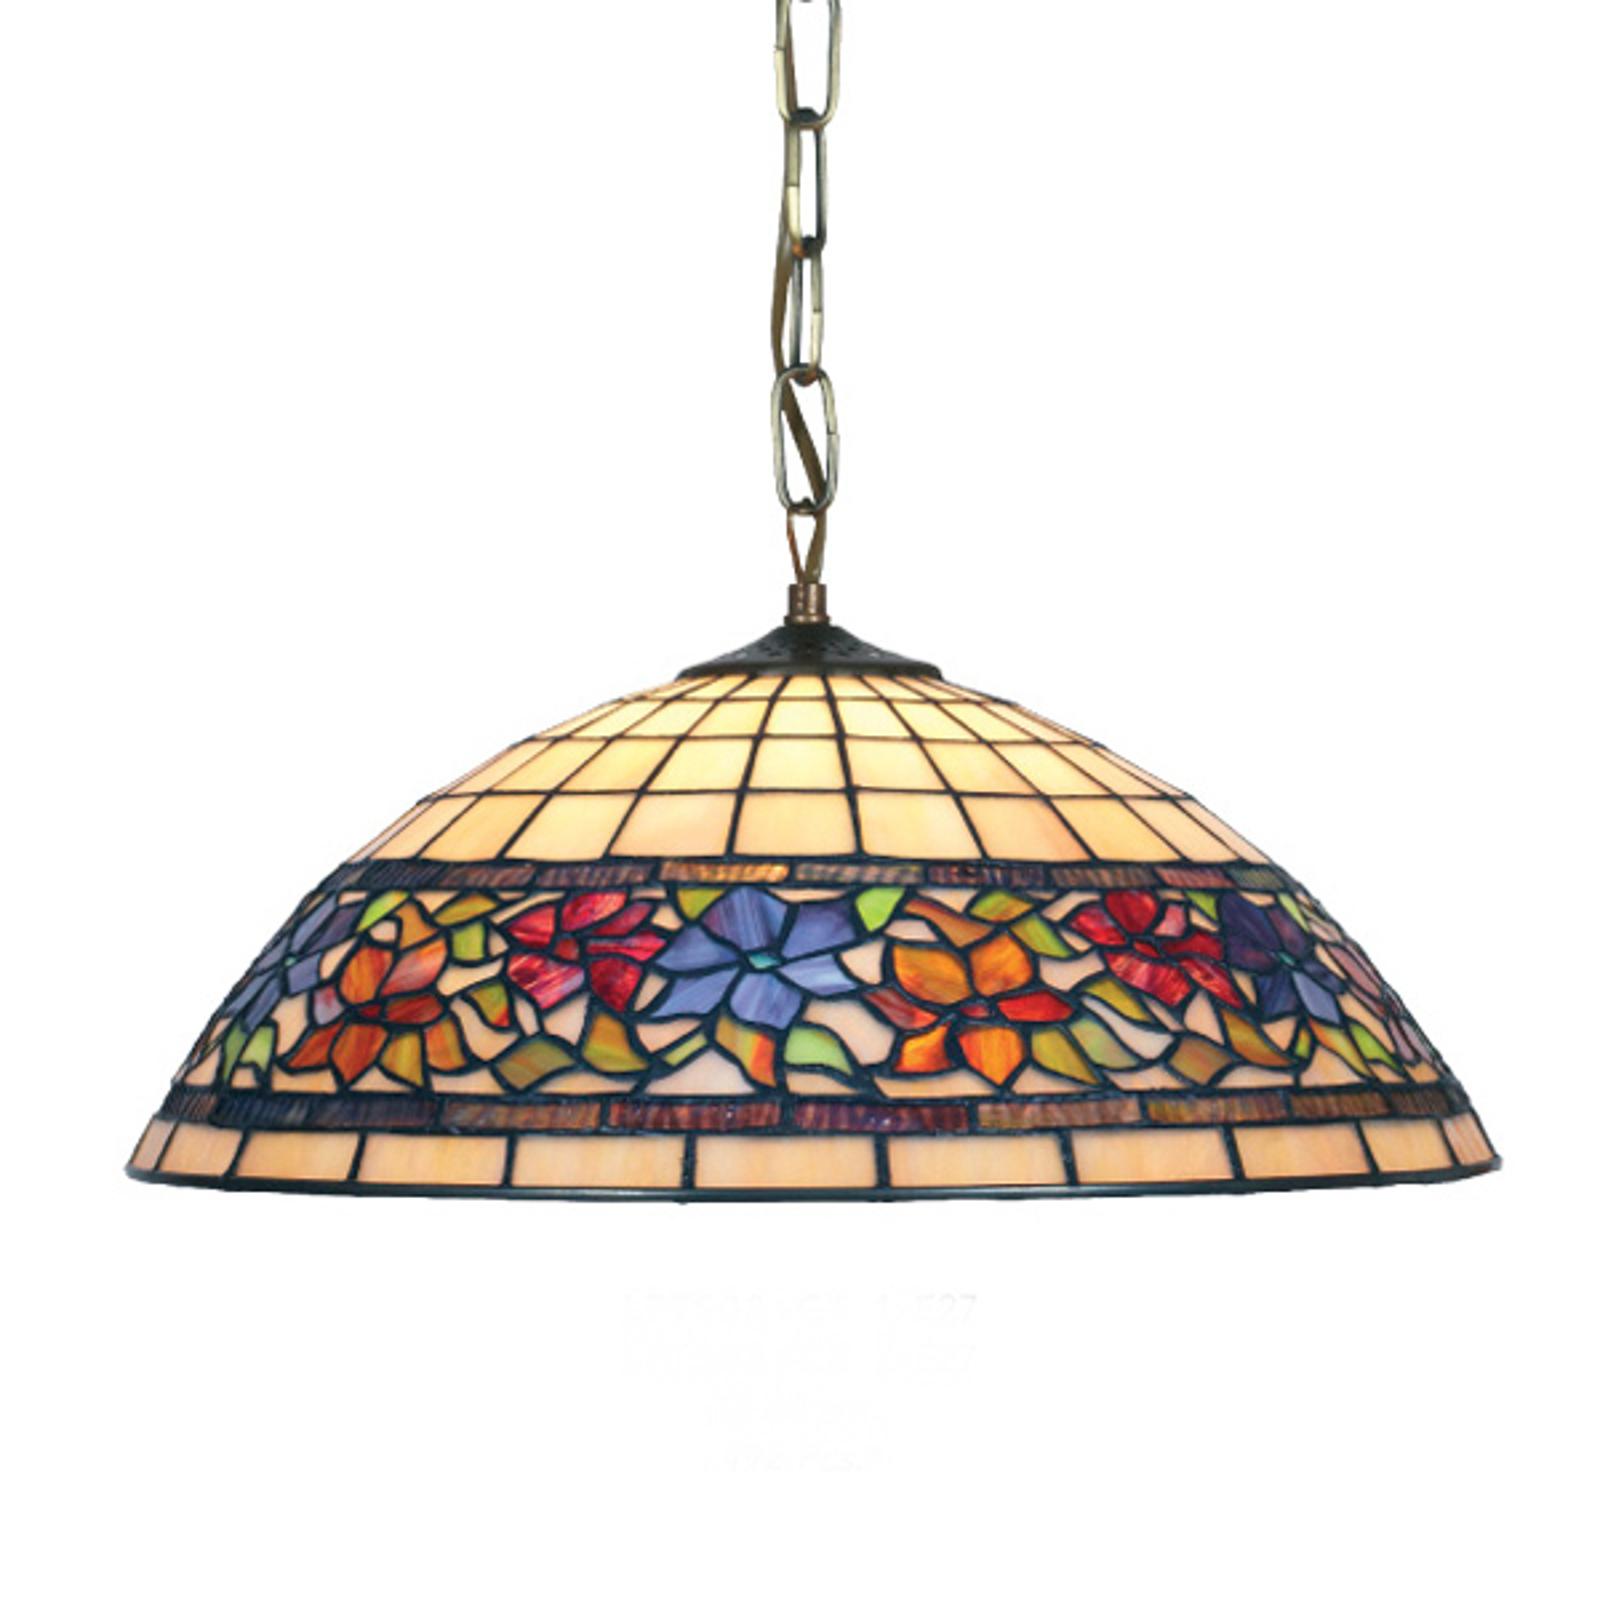 Tiffany style hanging lamp Flora, 2 x E27_1032127_1